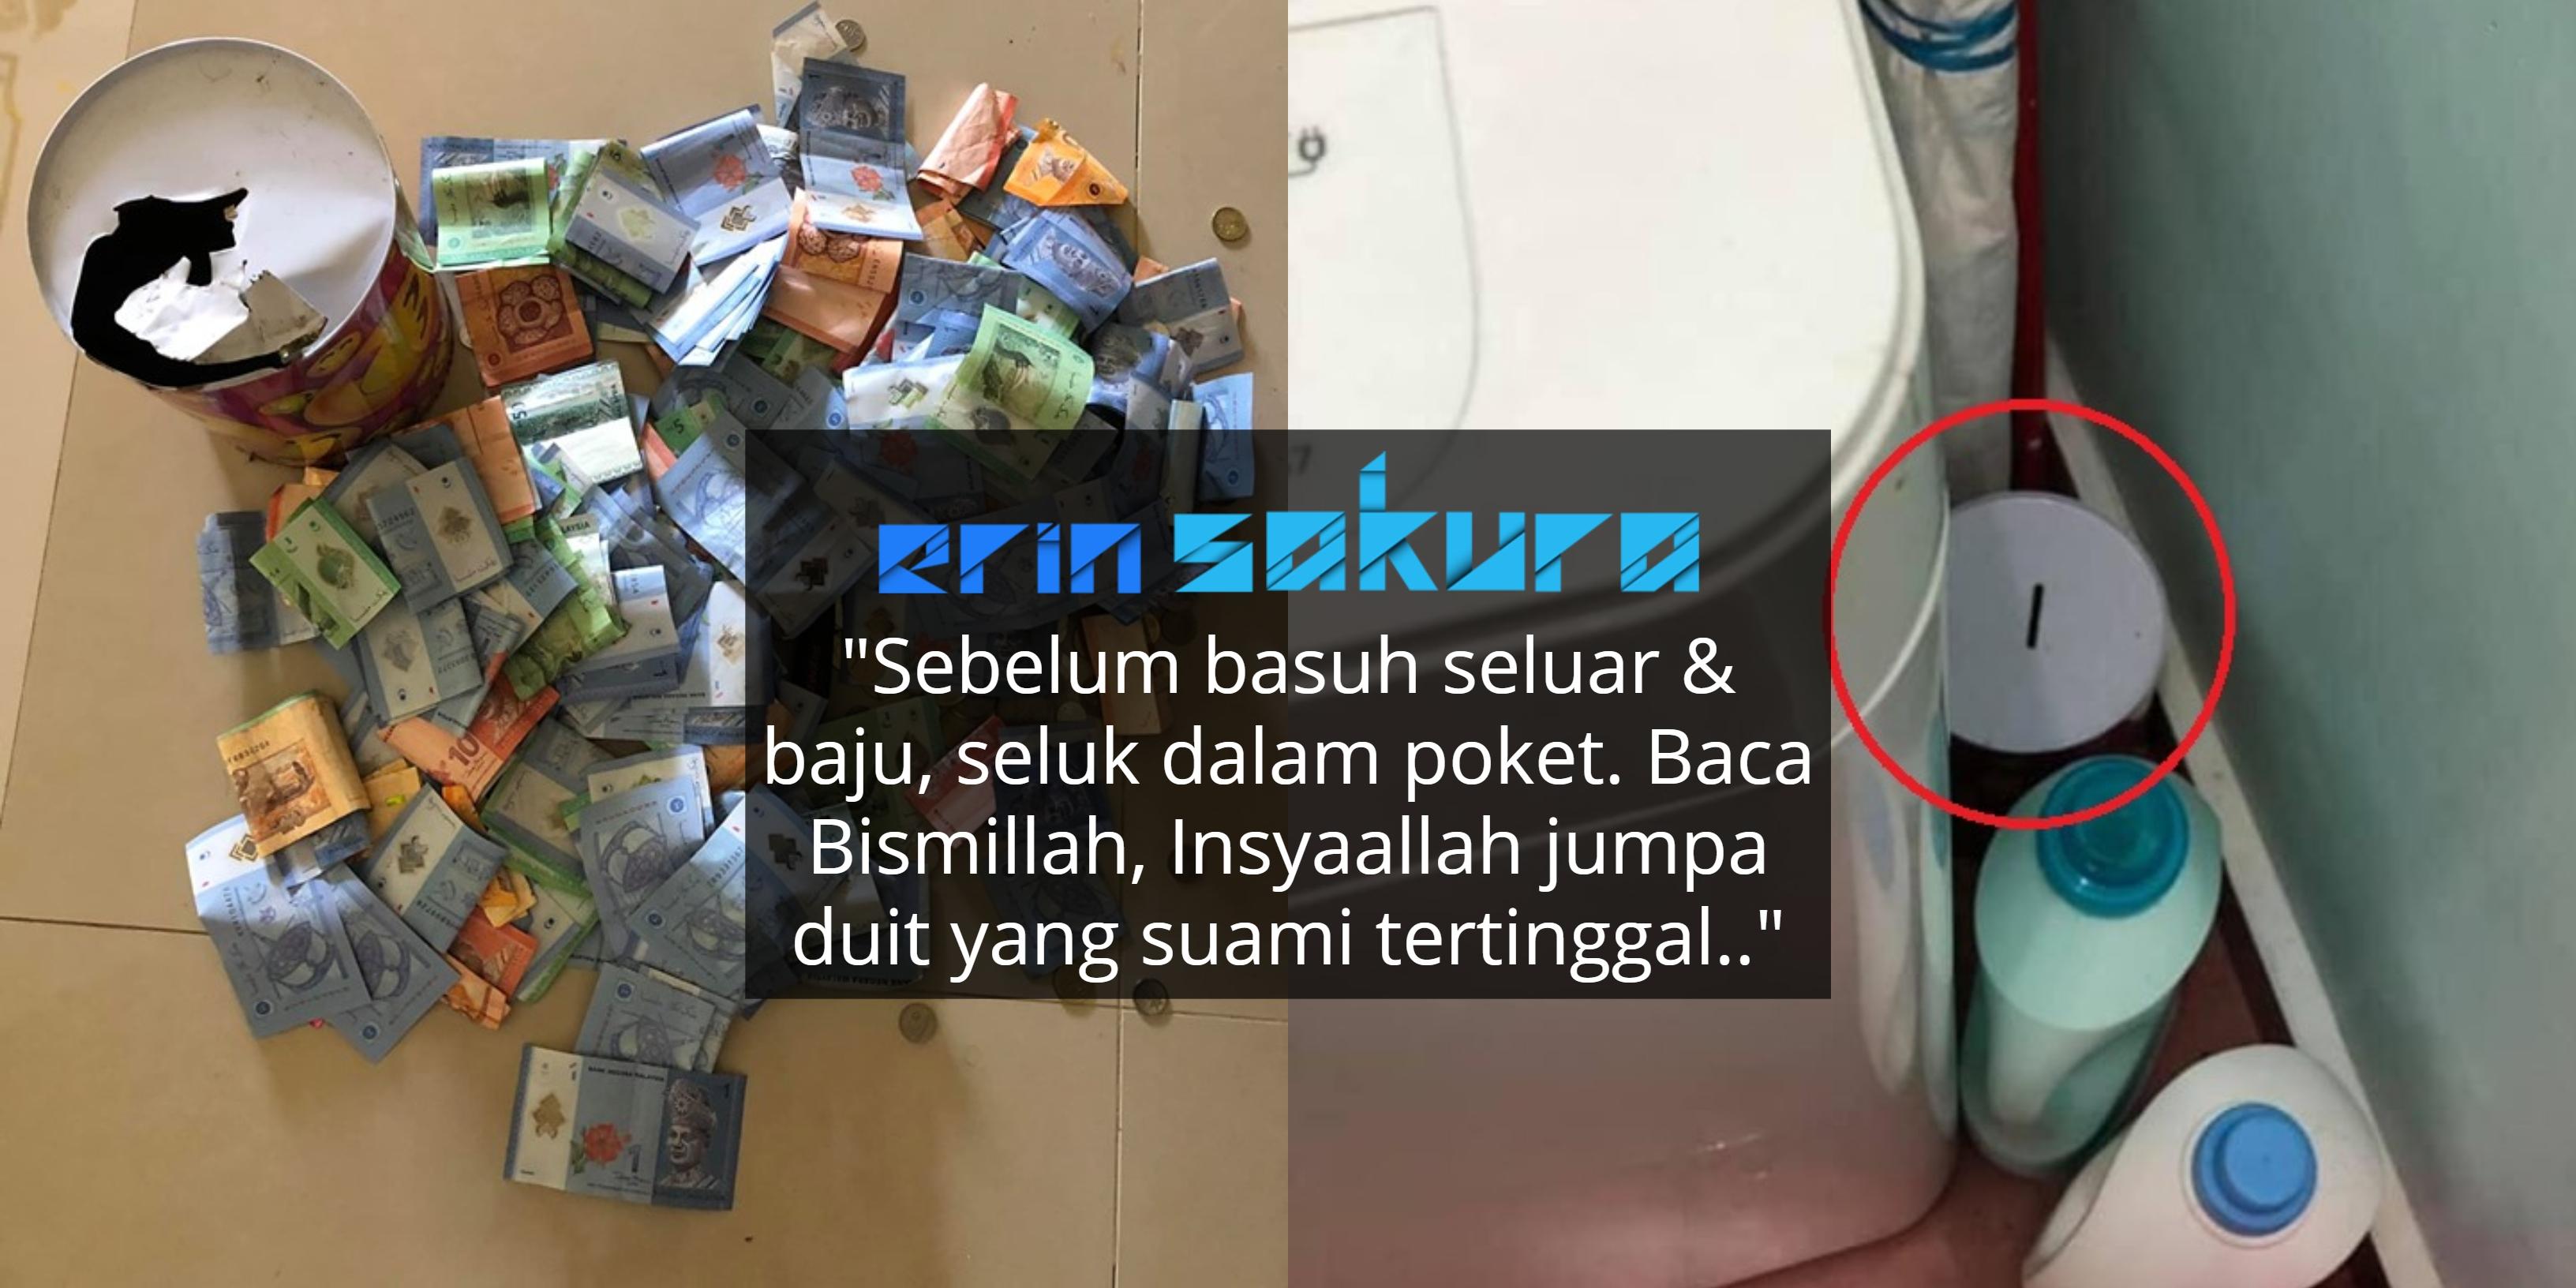 Guna Teknik Unik Menabung Tepi Mesin Basuh, Isteri Raih Hampir RM1,500 Setahun!